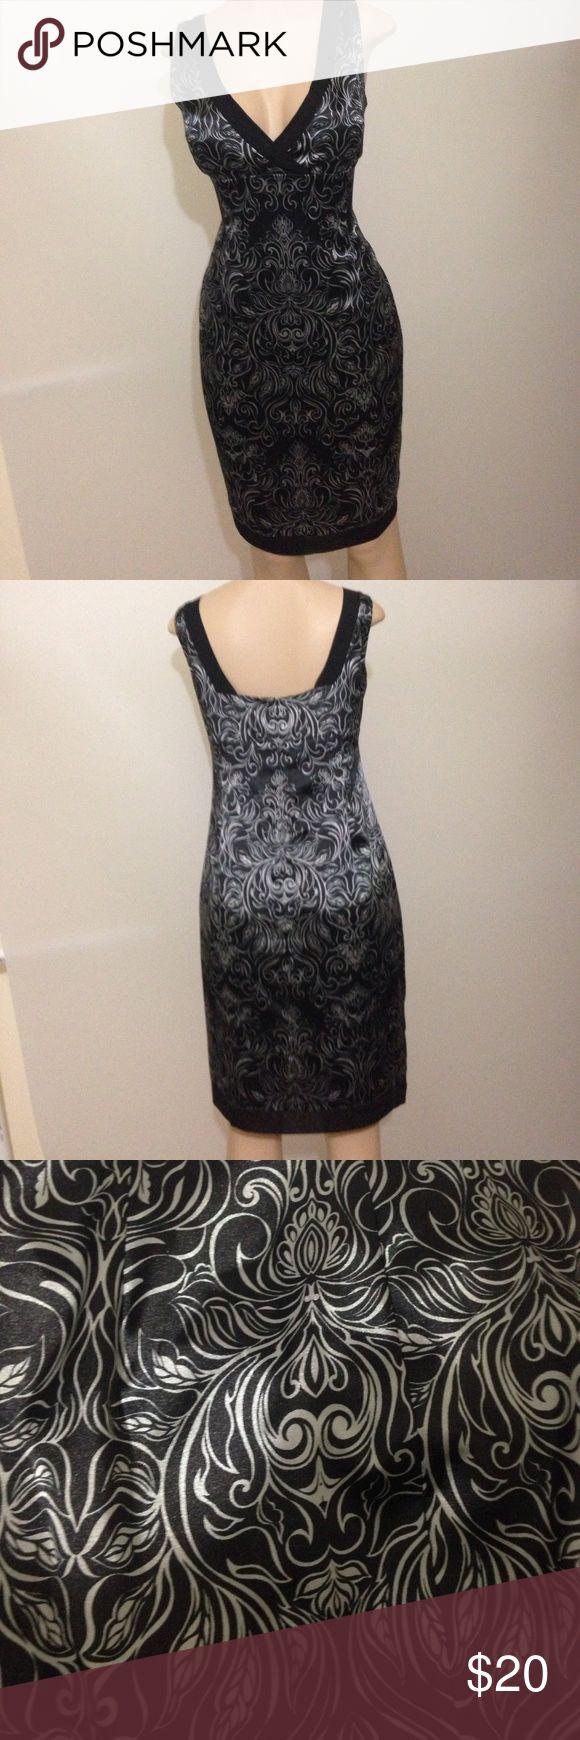 Jones Wear dress. Black and silver floral Sz 12 Formal black and silver dress Bust 19, Waist 17, Length 38. Jones Wear Dress Dresses Midi